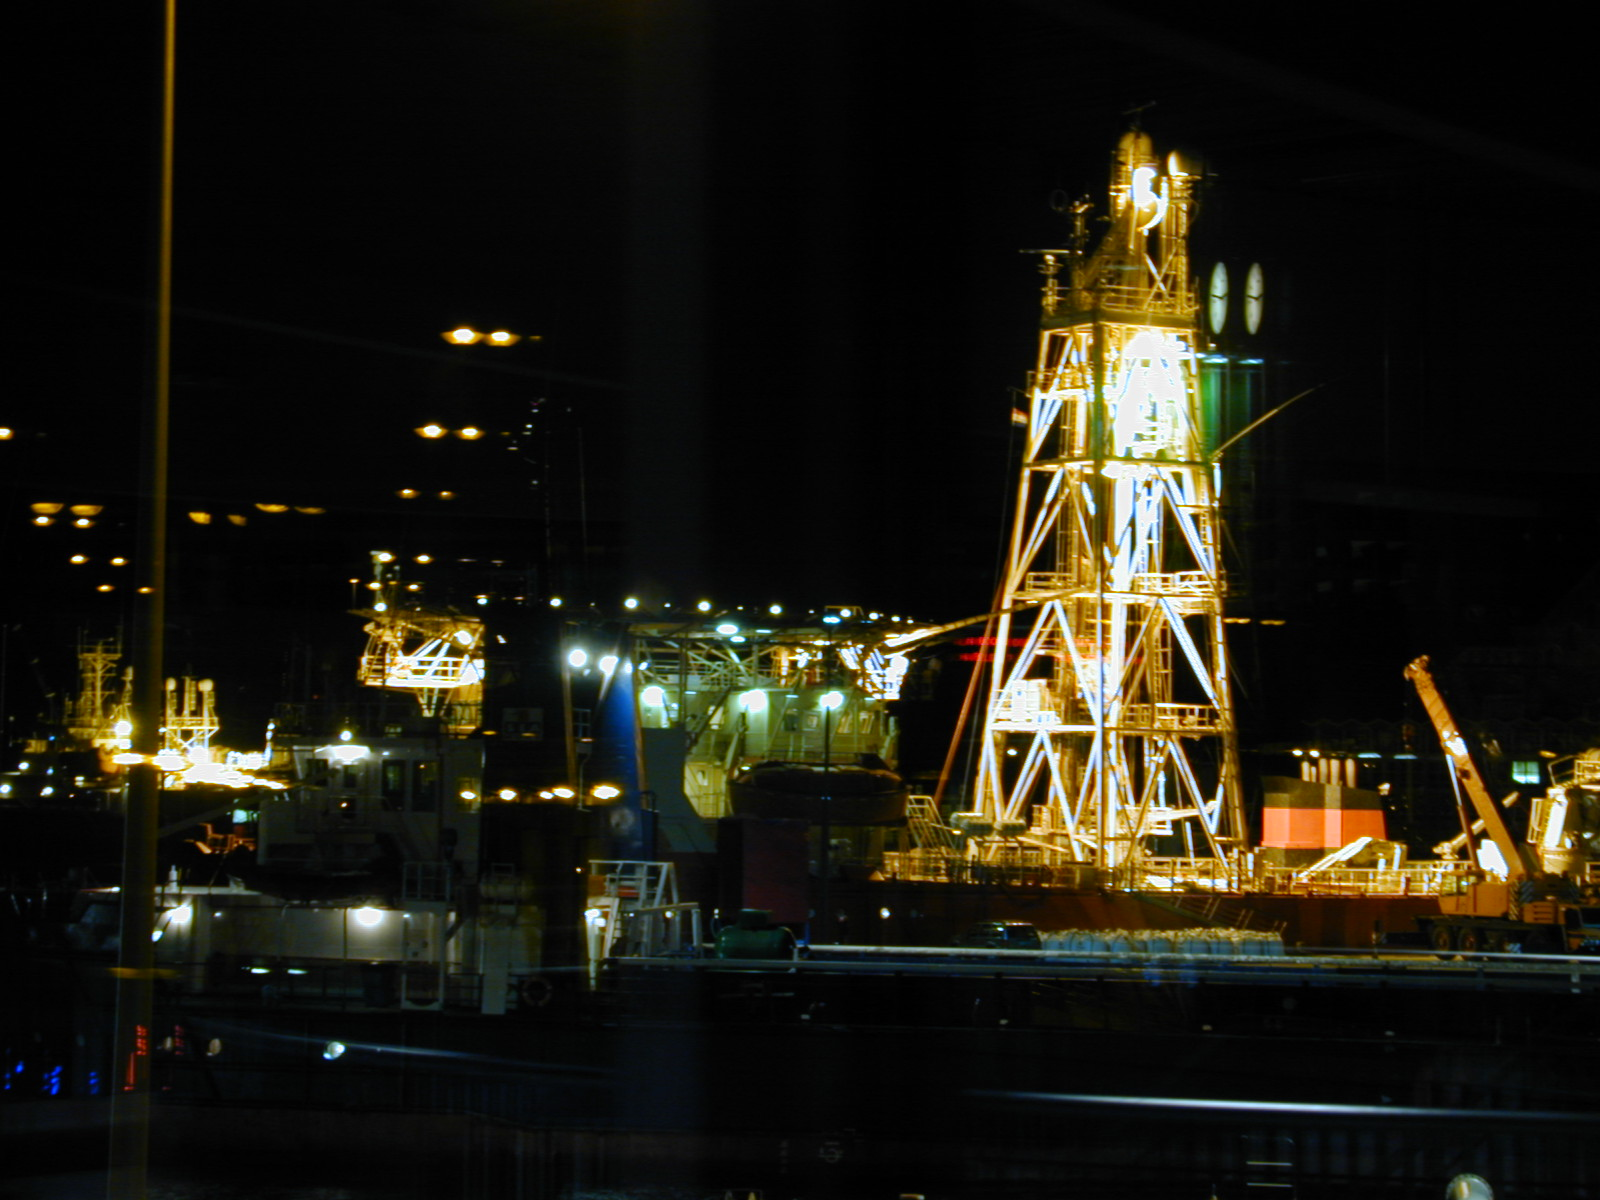 sea harbor harbour dark night bright lights ship ships dock docks nighttime